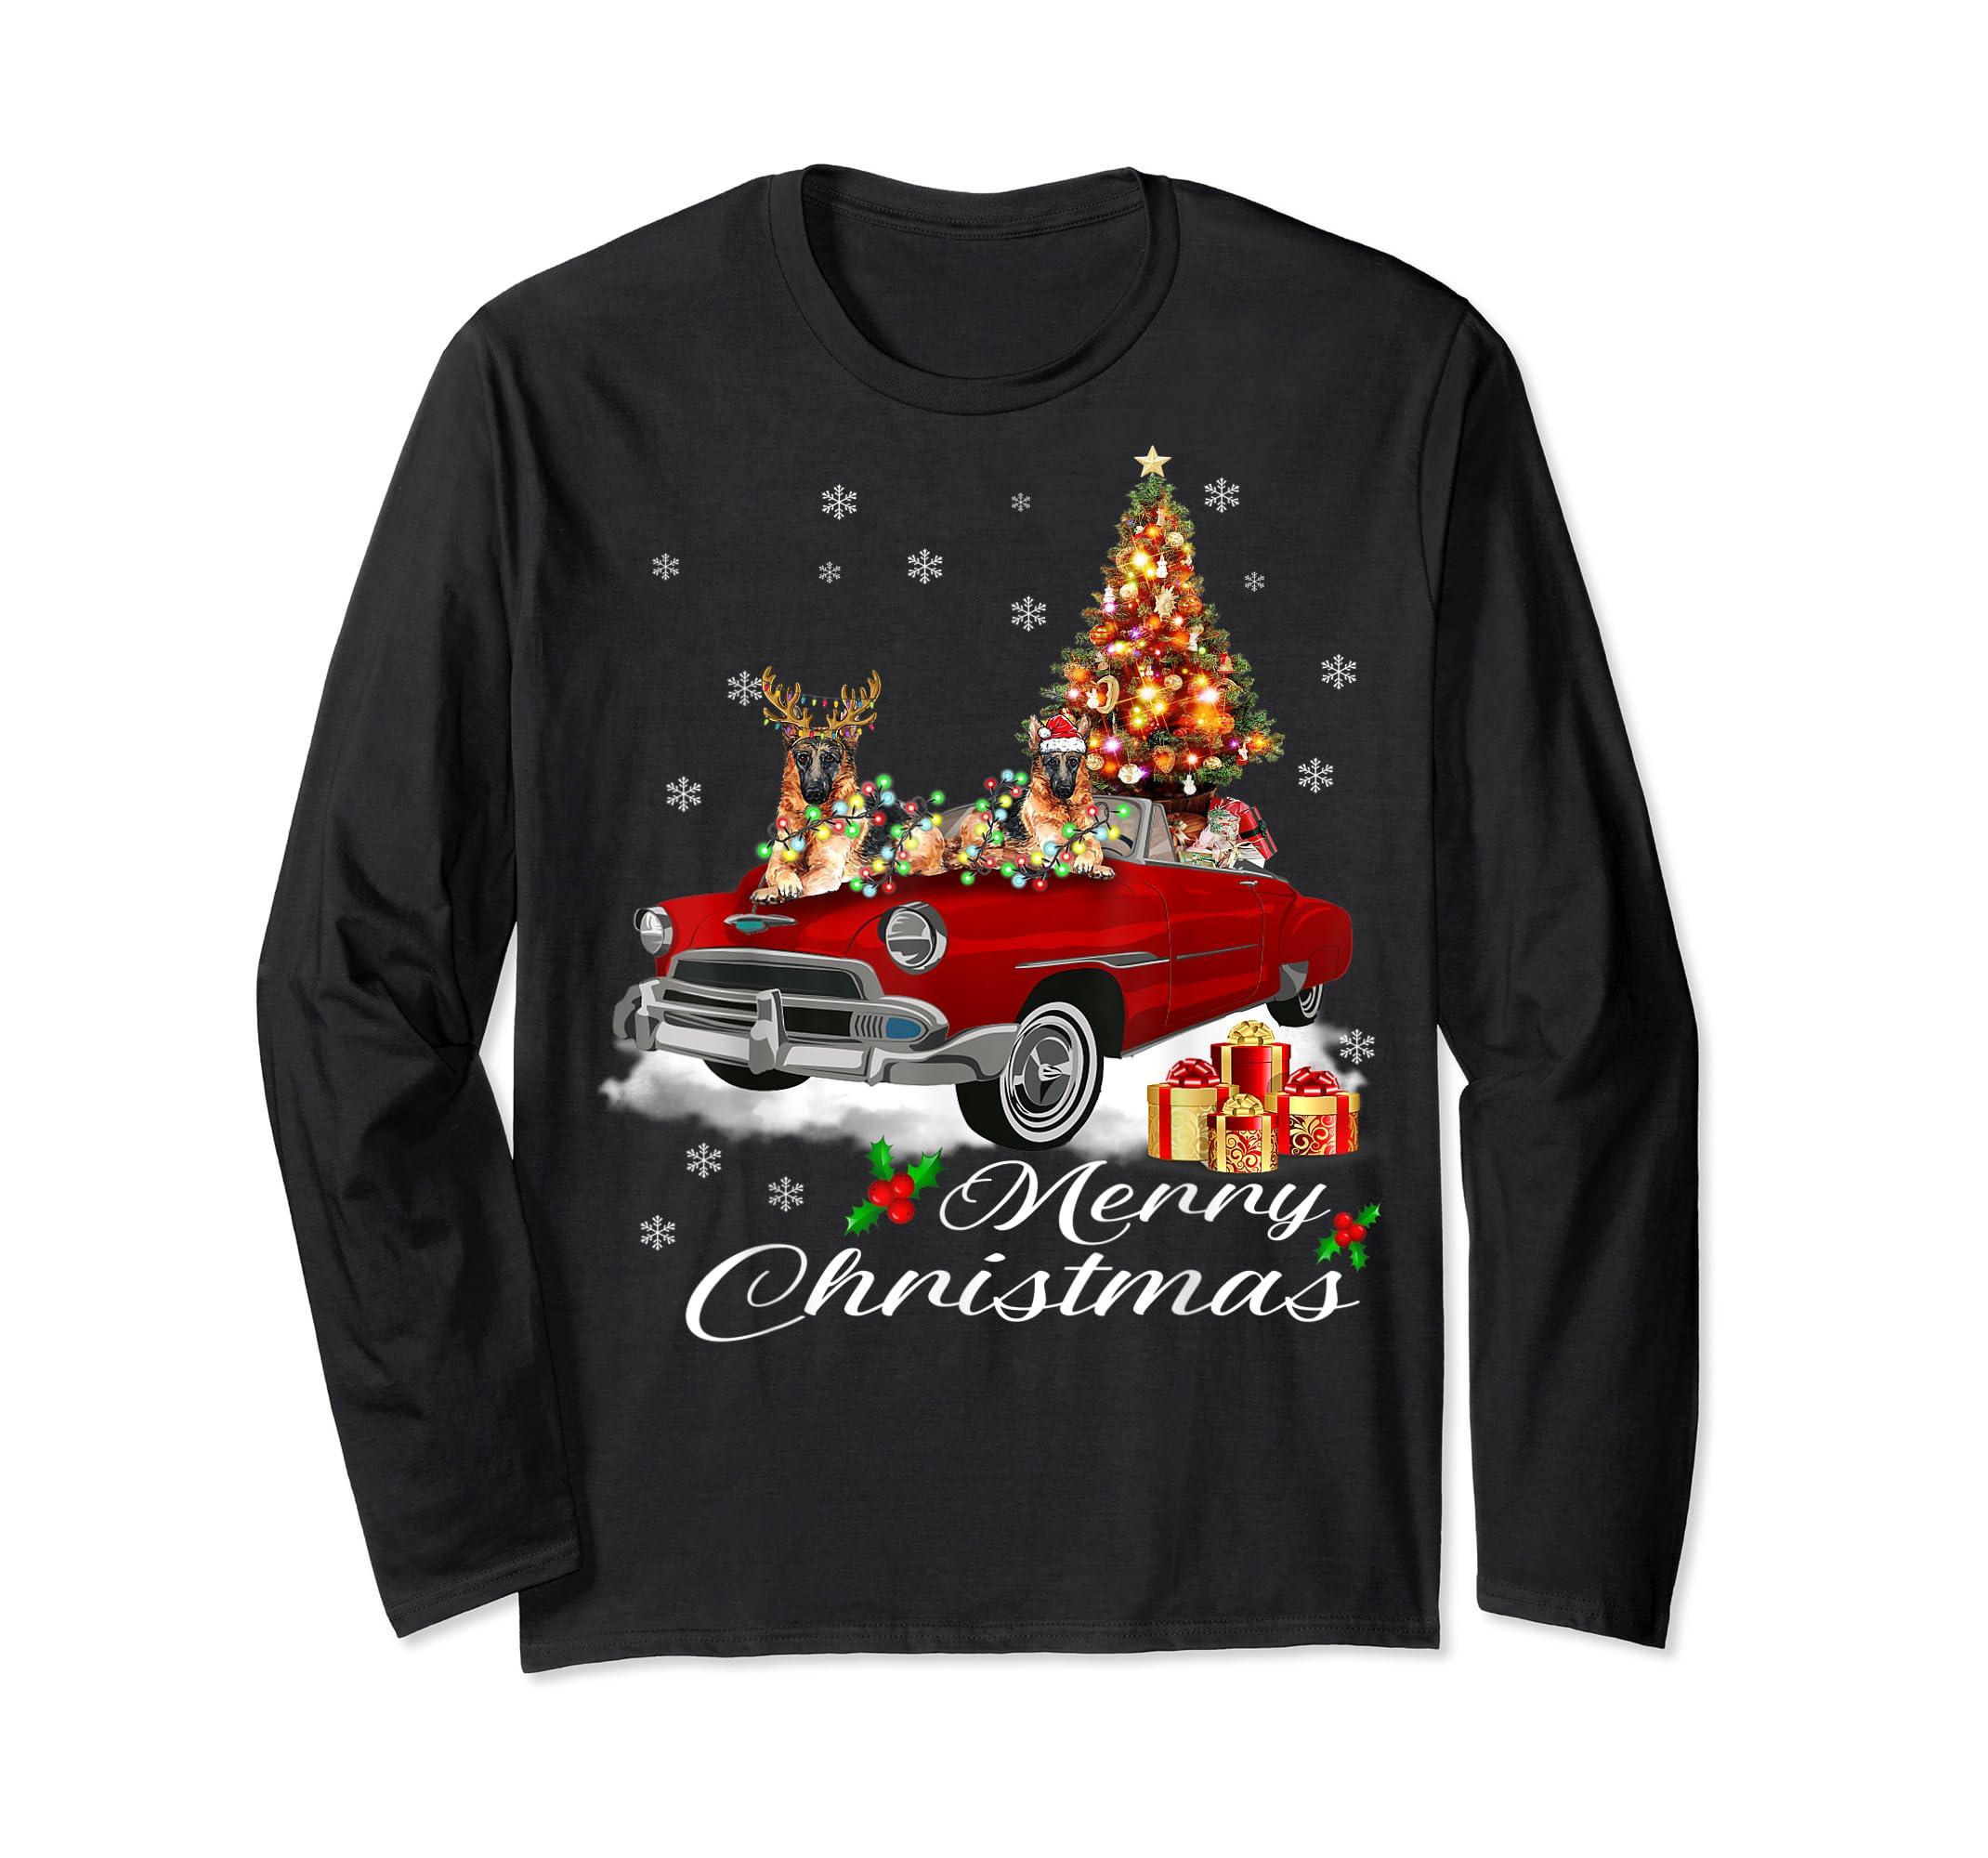 German Shepherd on Red Truck Christmas Pajama Dog Lover Gift T-Shirt-Long Sleeve-Black